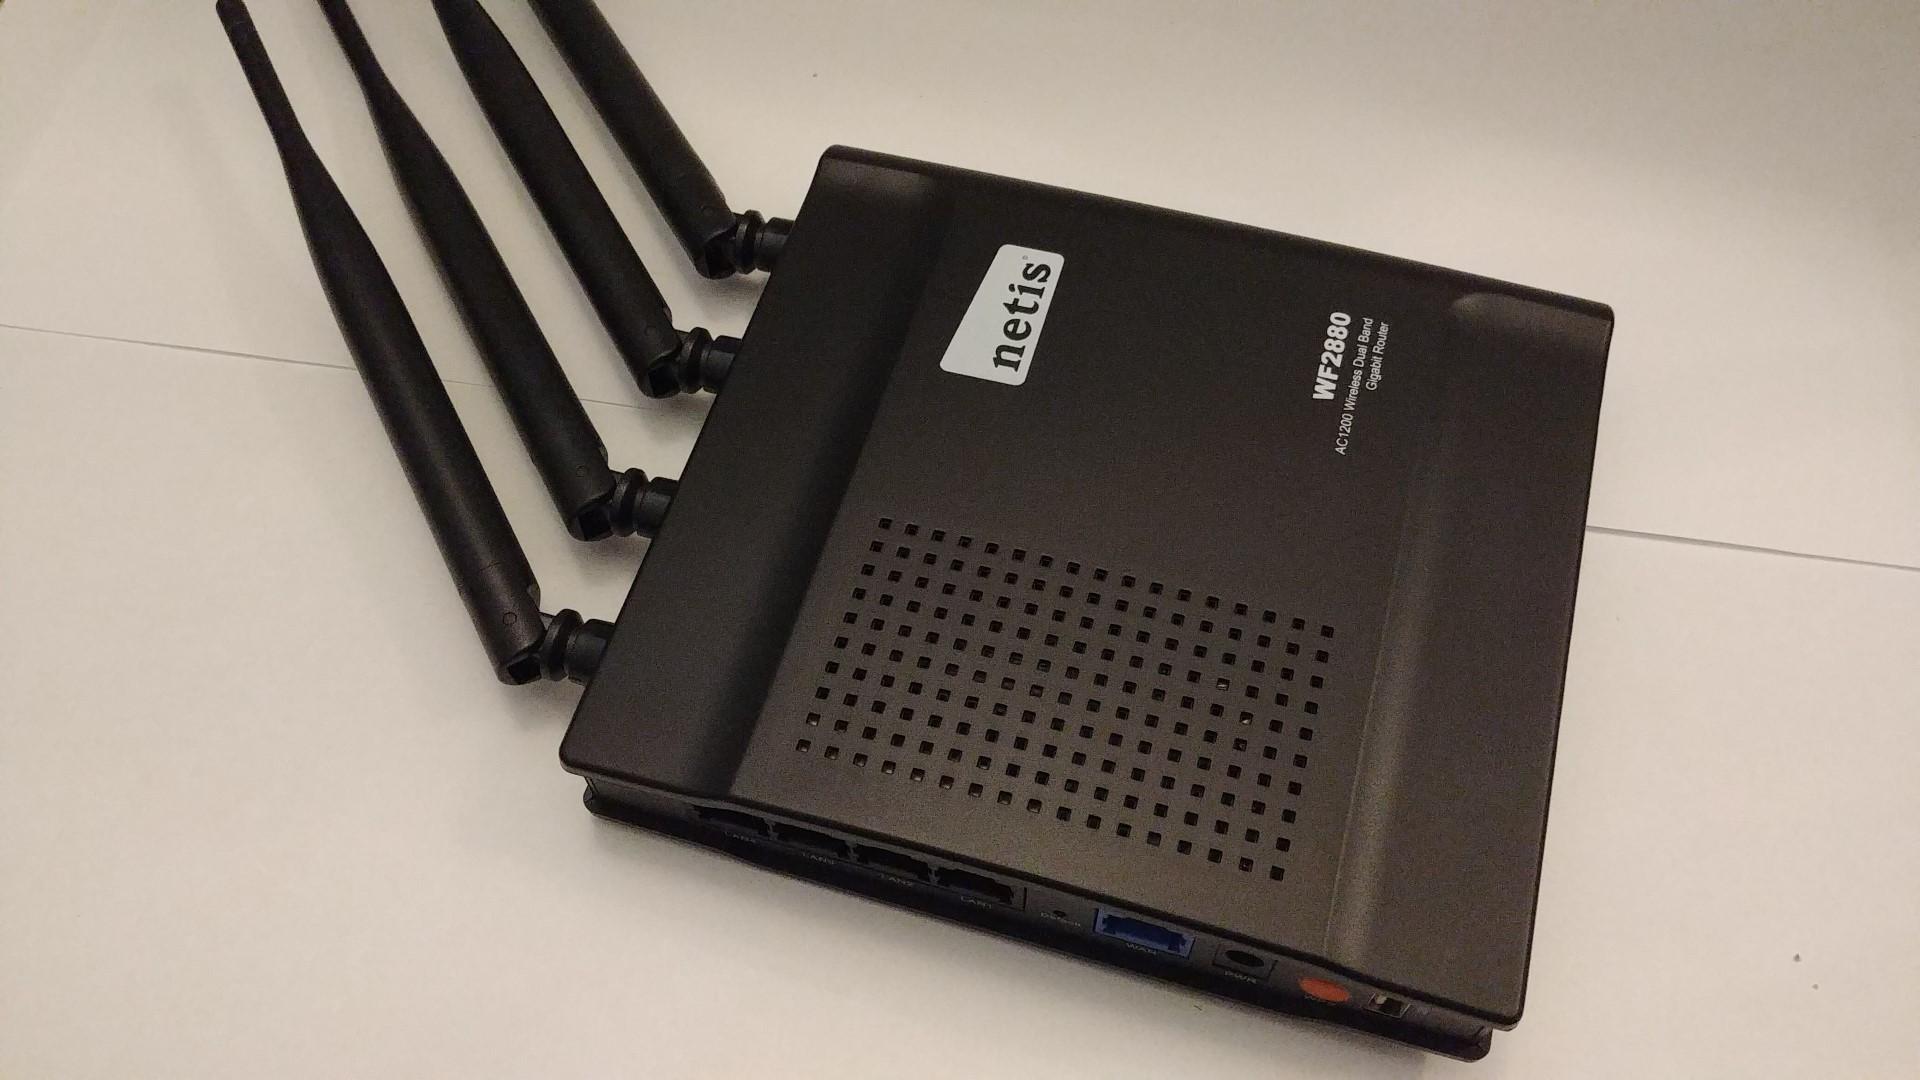 Harga Dan Spesifikasi Netis Wf2419e 300mbps Wireless Router N 2 Aa6 1710 Macbear Baju Anak Piyama Happy Cat Size 6 Abu Muda Wf2880 Ac1200 Gbitx5 Usb Fvat 7318569196 Oficjalne Antena